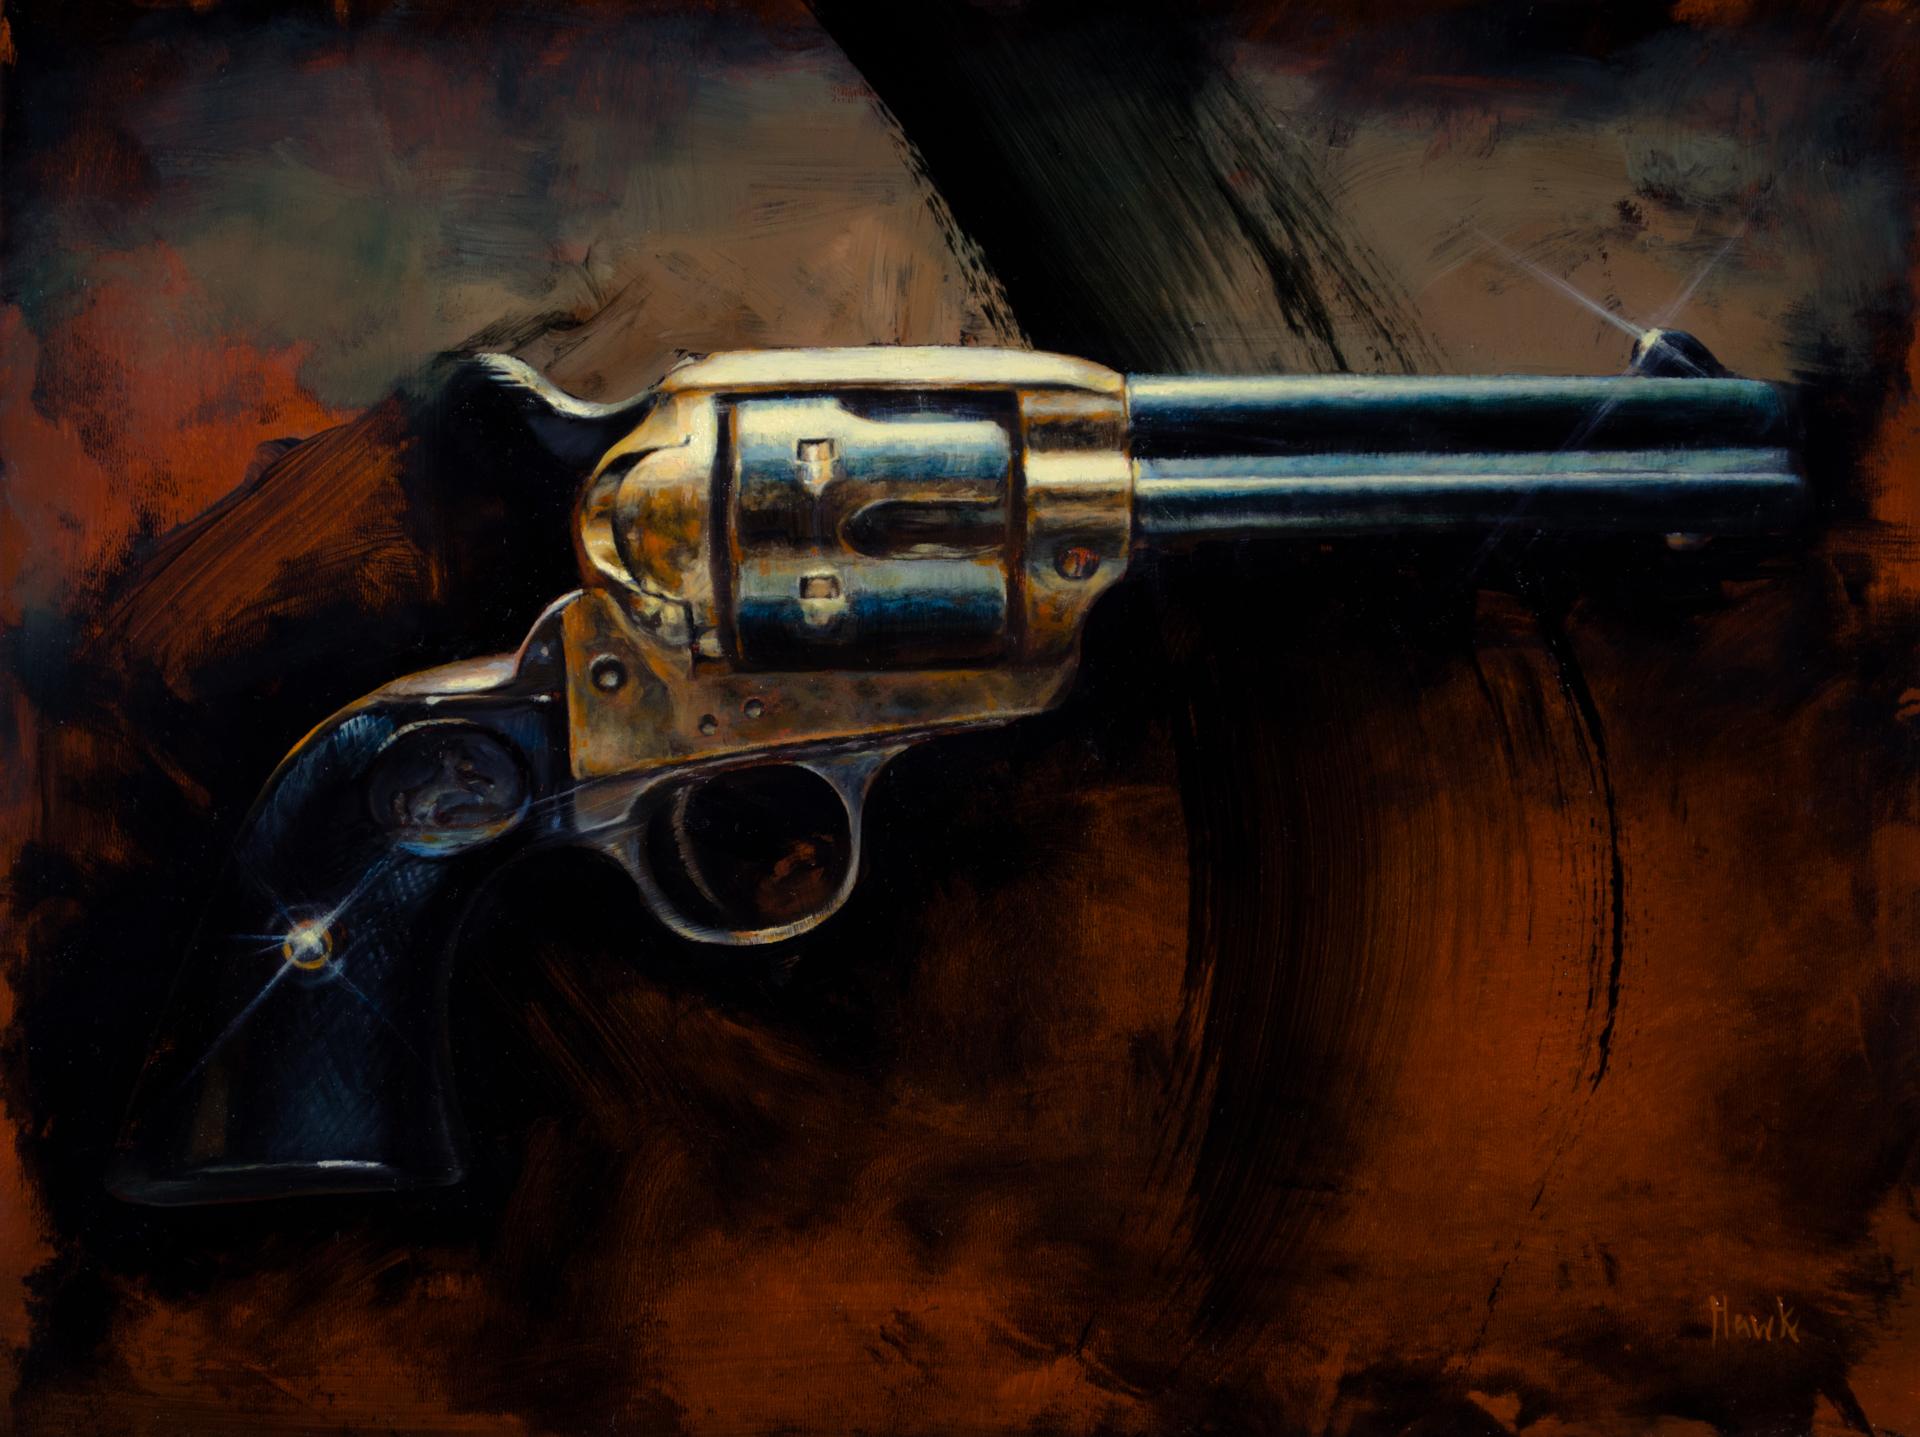 Cowboy's Colt by Dana Hawk